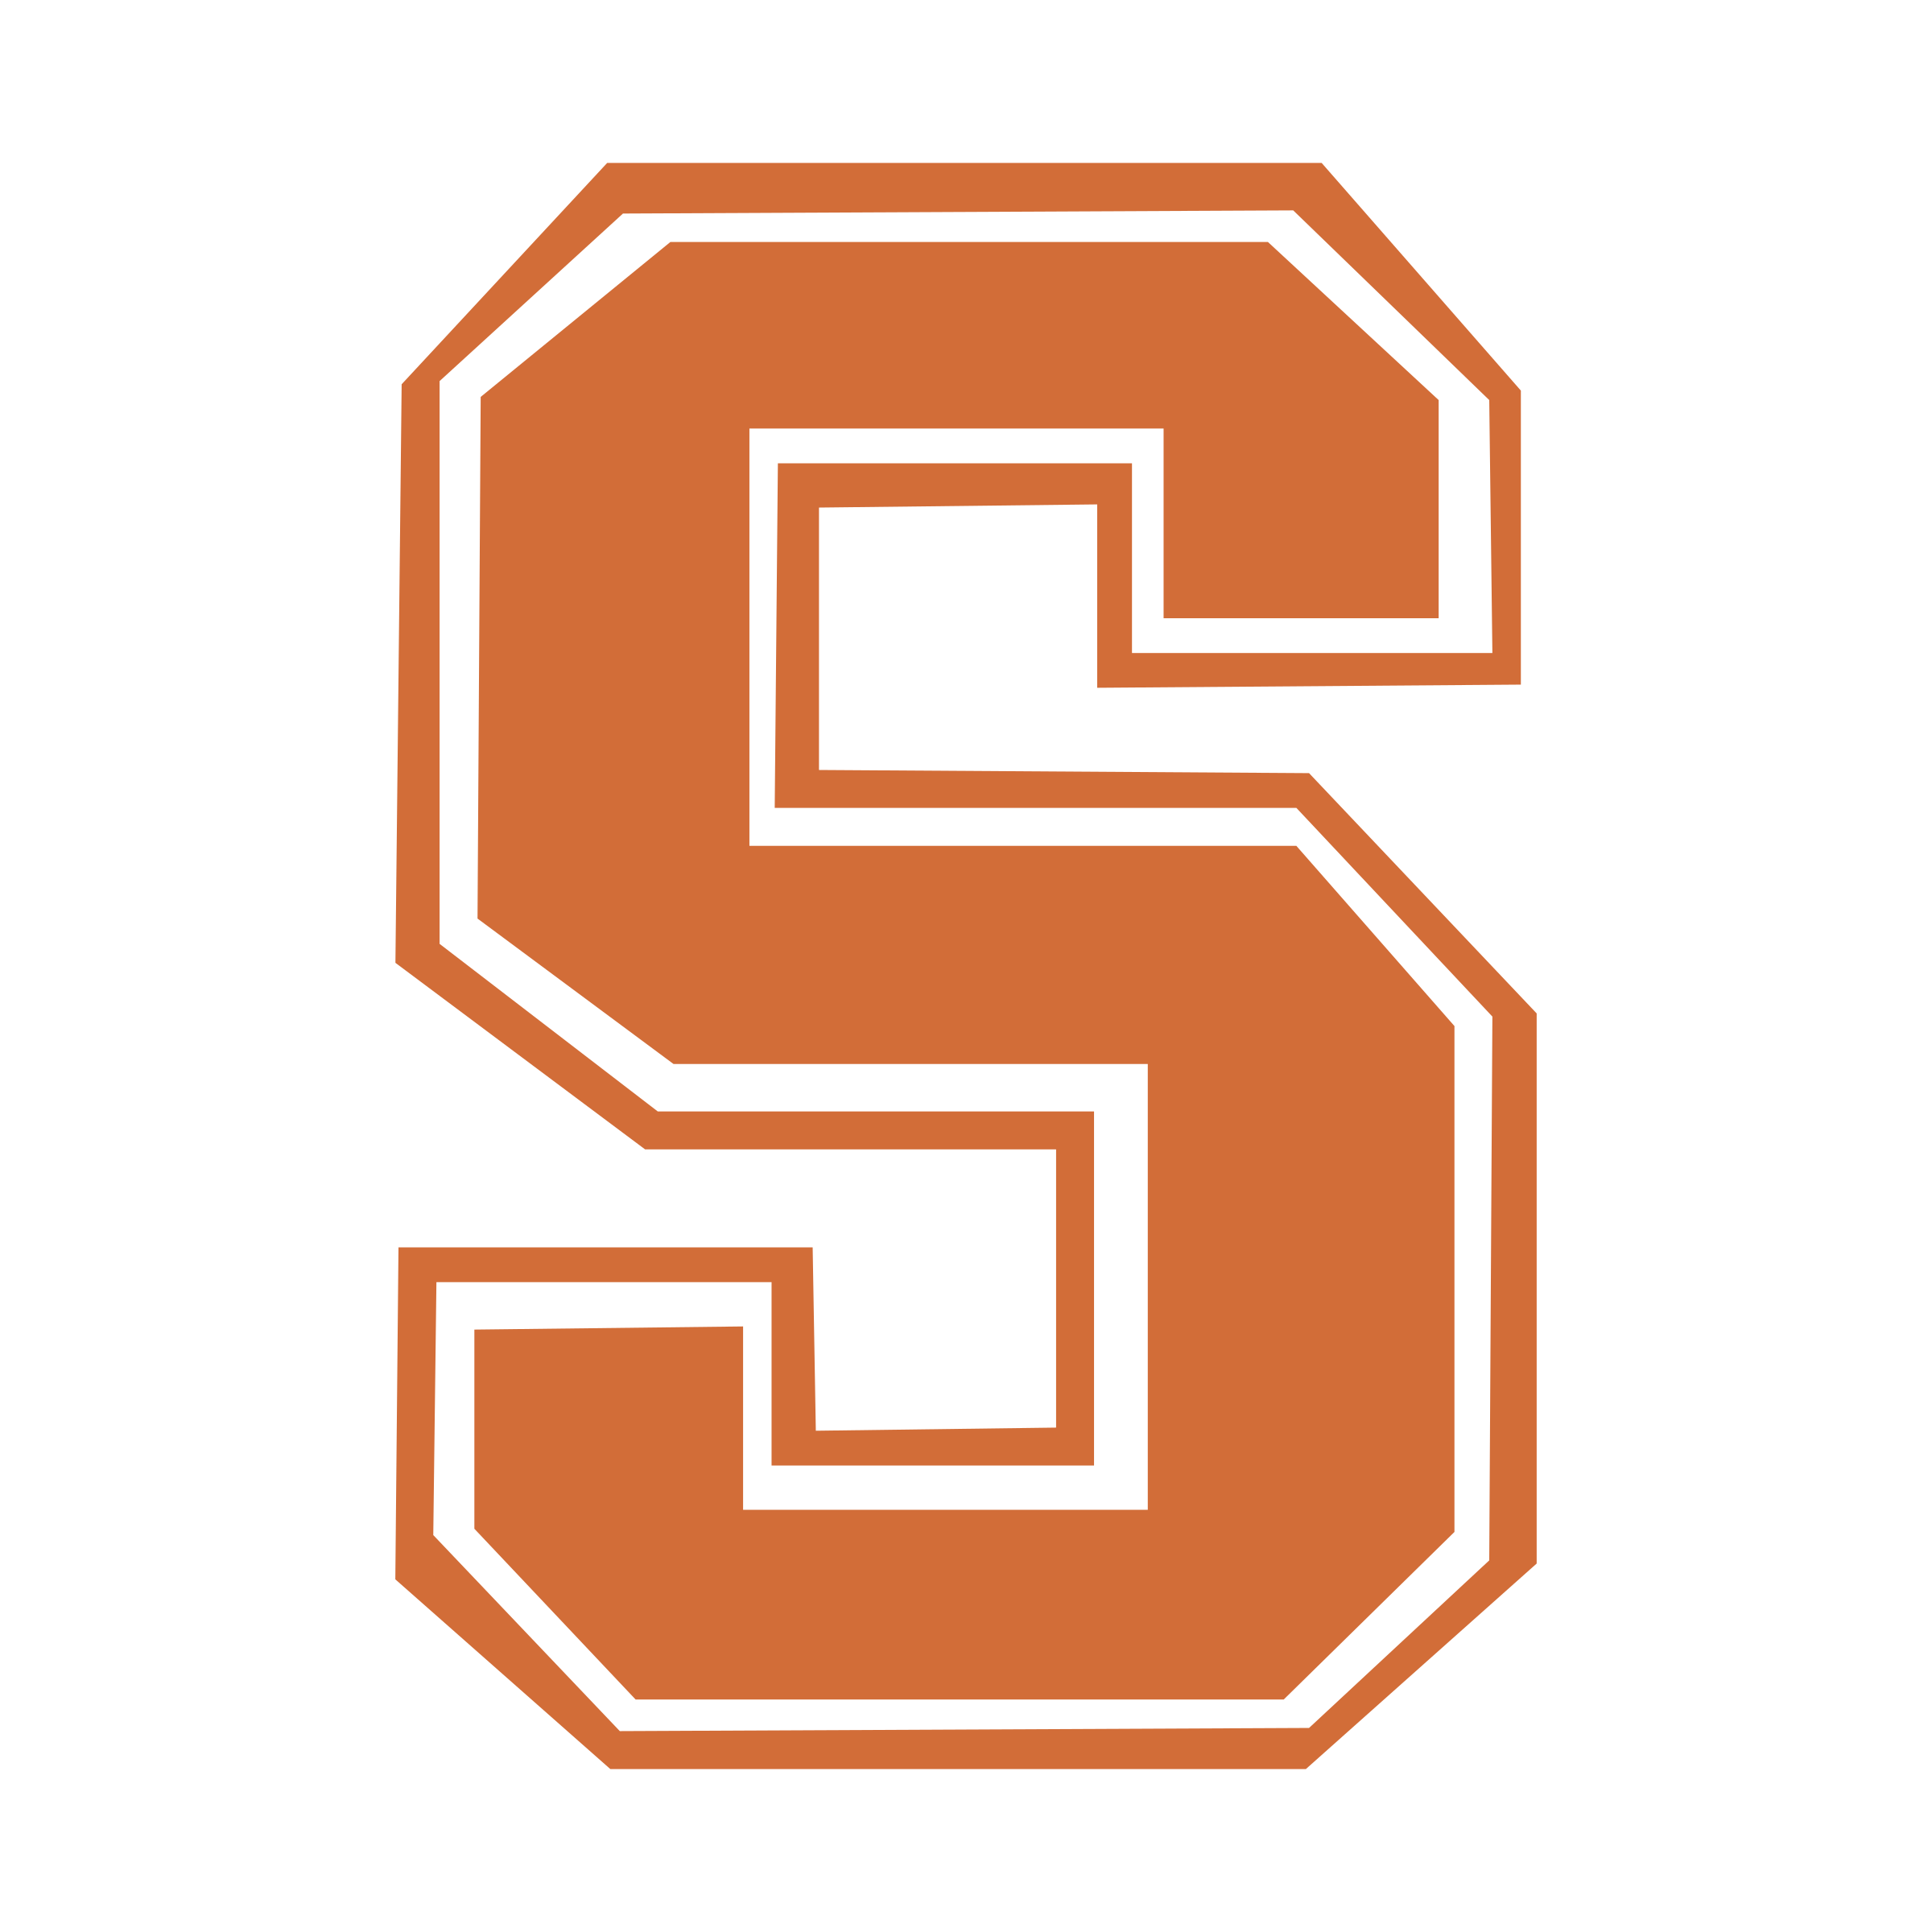 Syracuse Logo Clip Art 1 Clip Art Vector Site